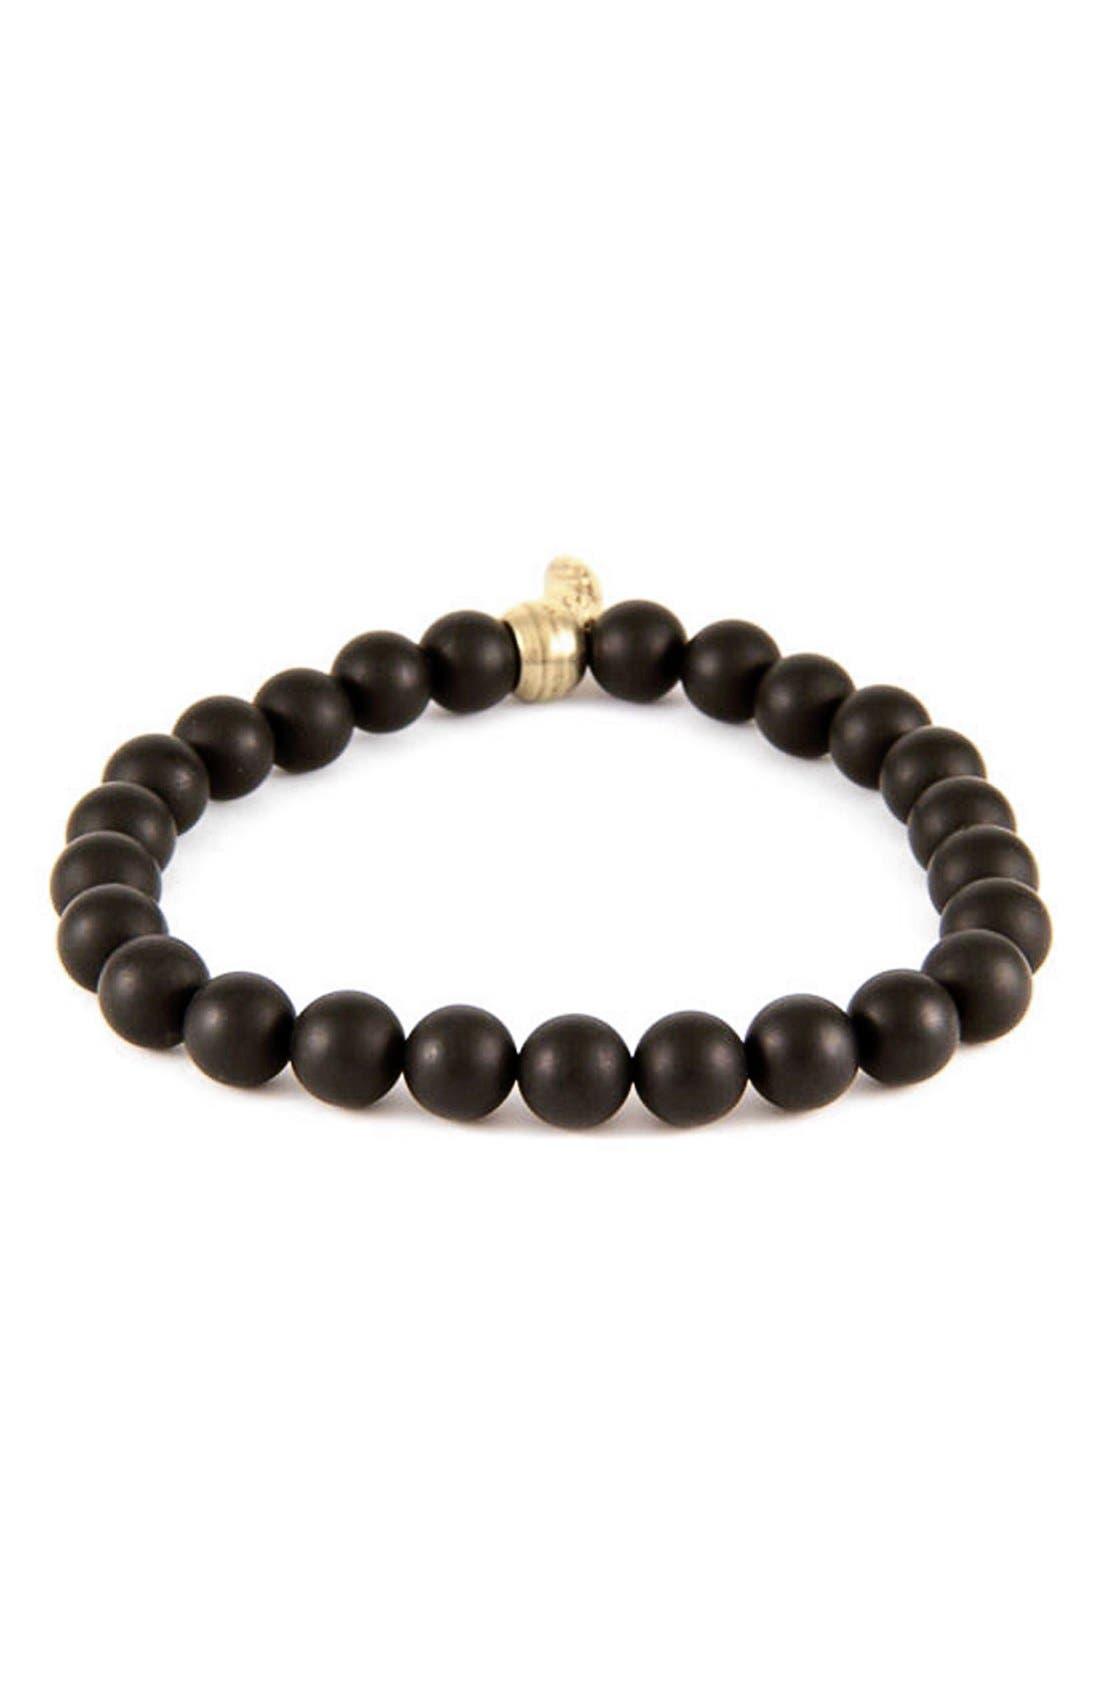 Alternate Image 1 Selected - Mr. Ettika Agate Bead Bracelet